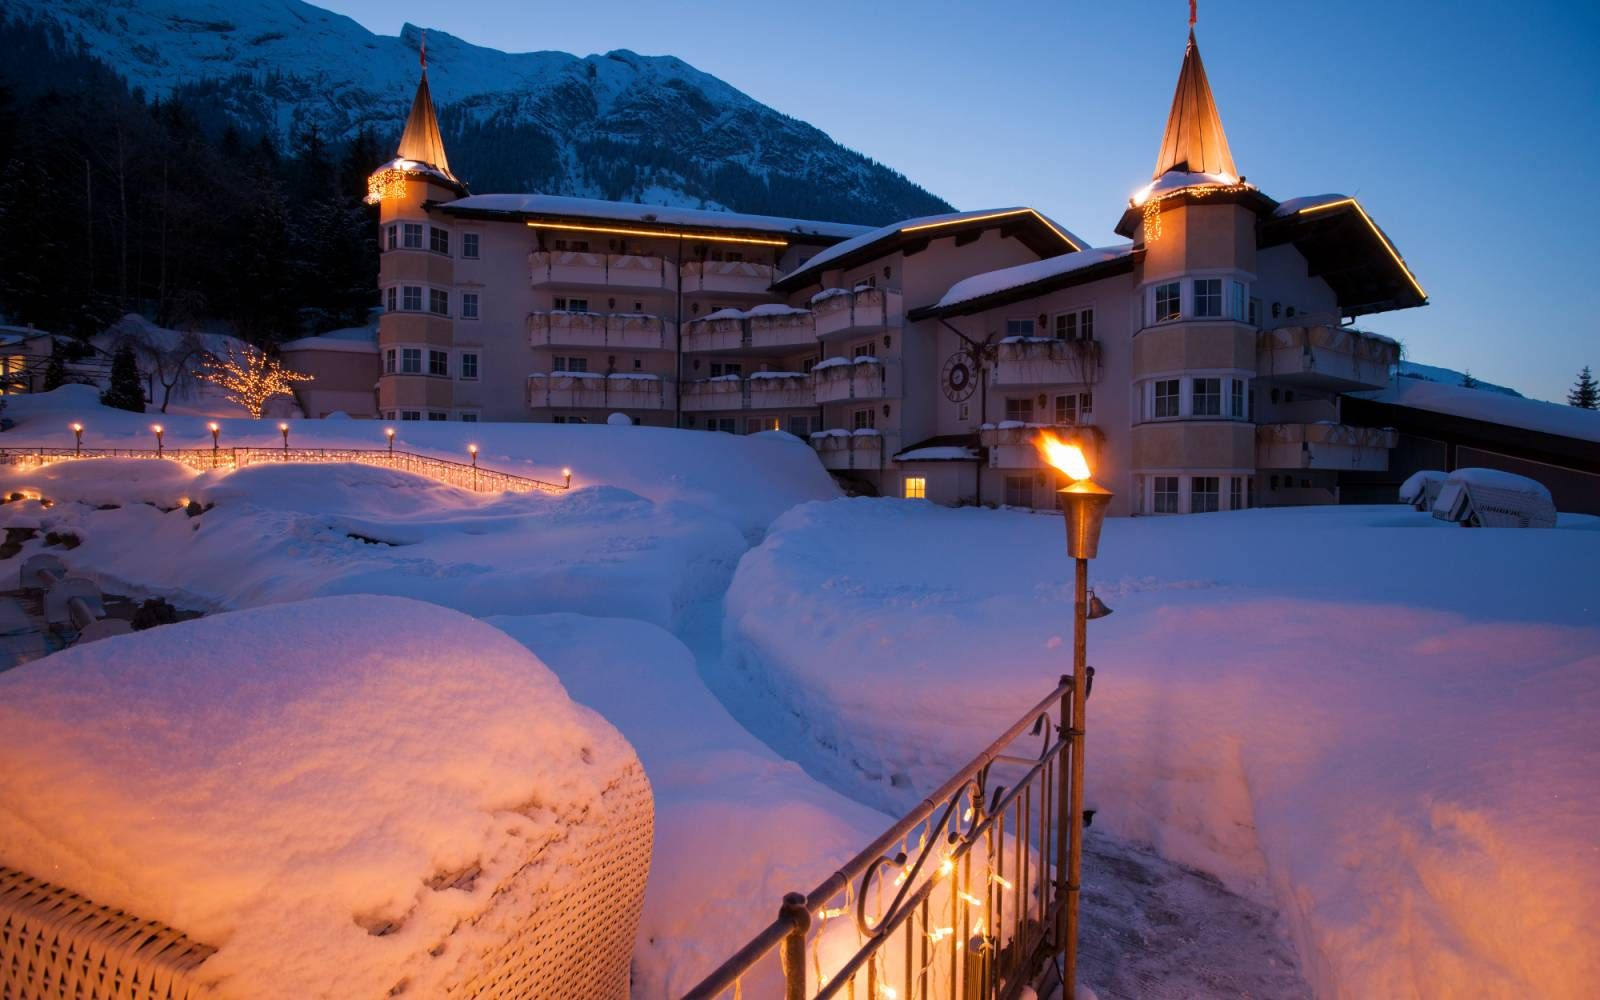 Posthotel, Achenkirch, Winter, Schnee, Dämmerung